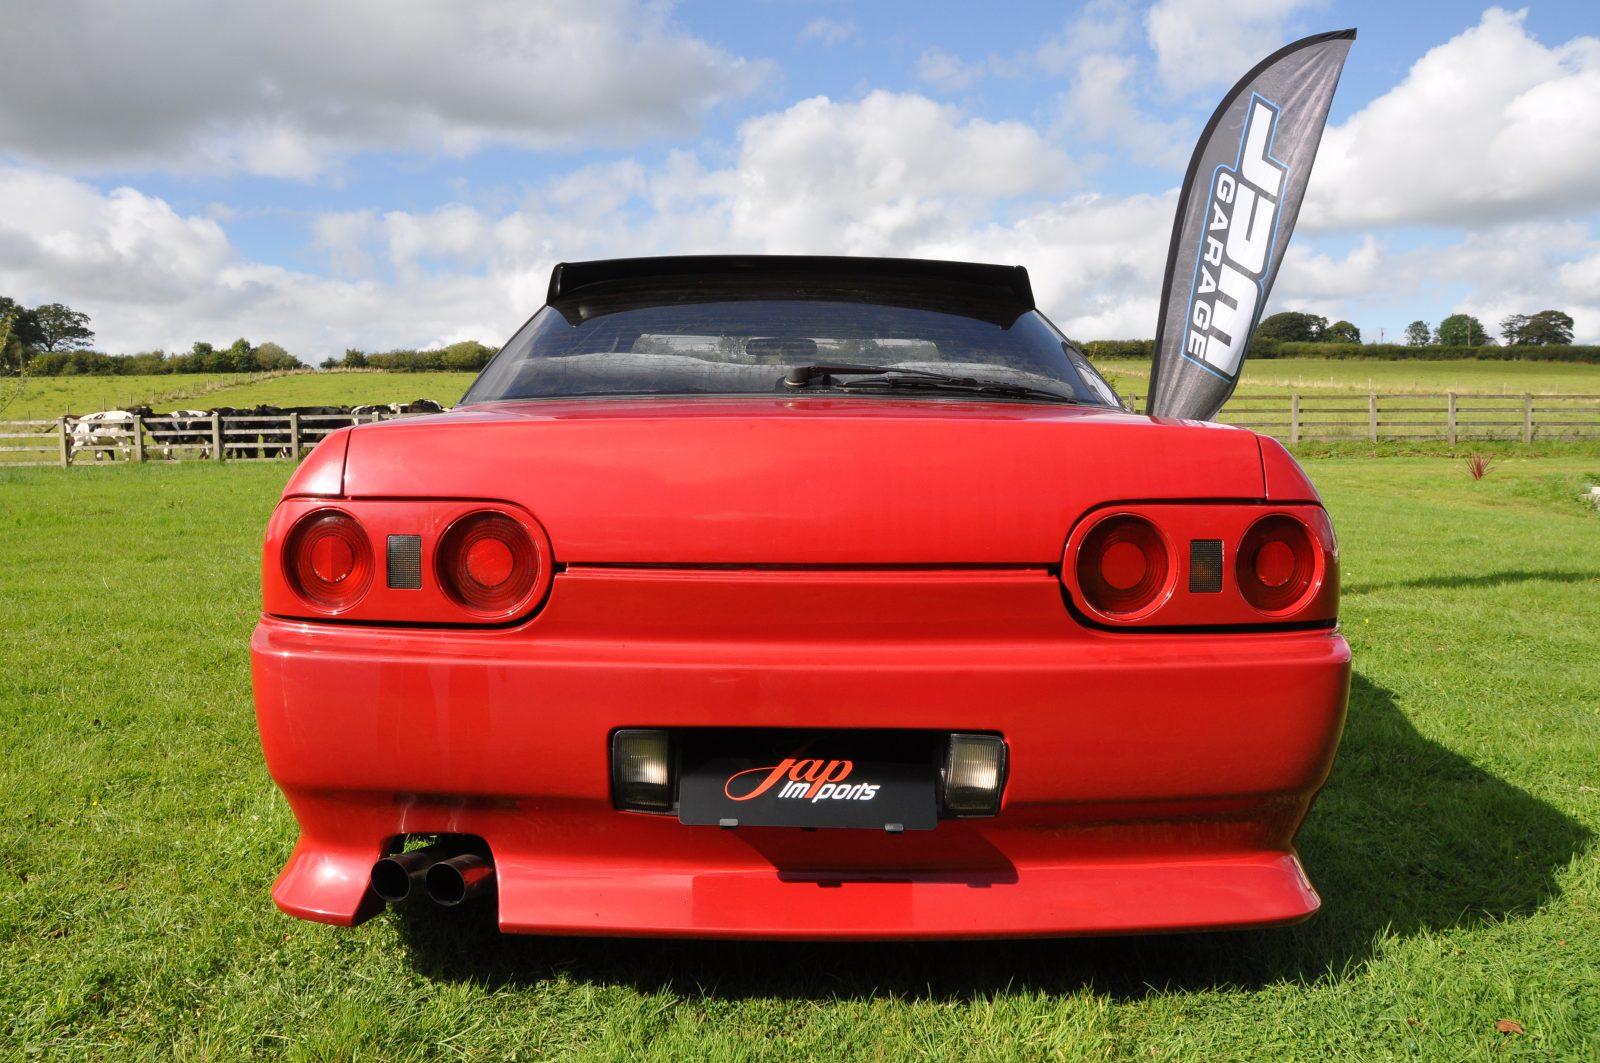 Nissan Skyline R32 GTS-T - Jap Imports UK